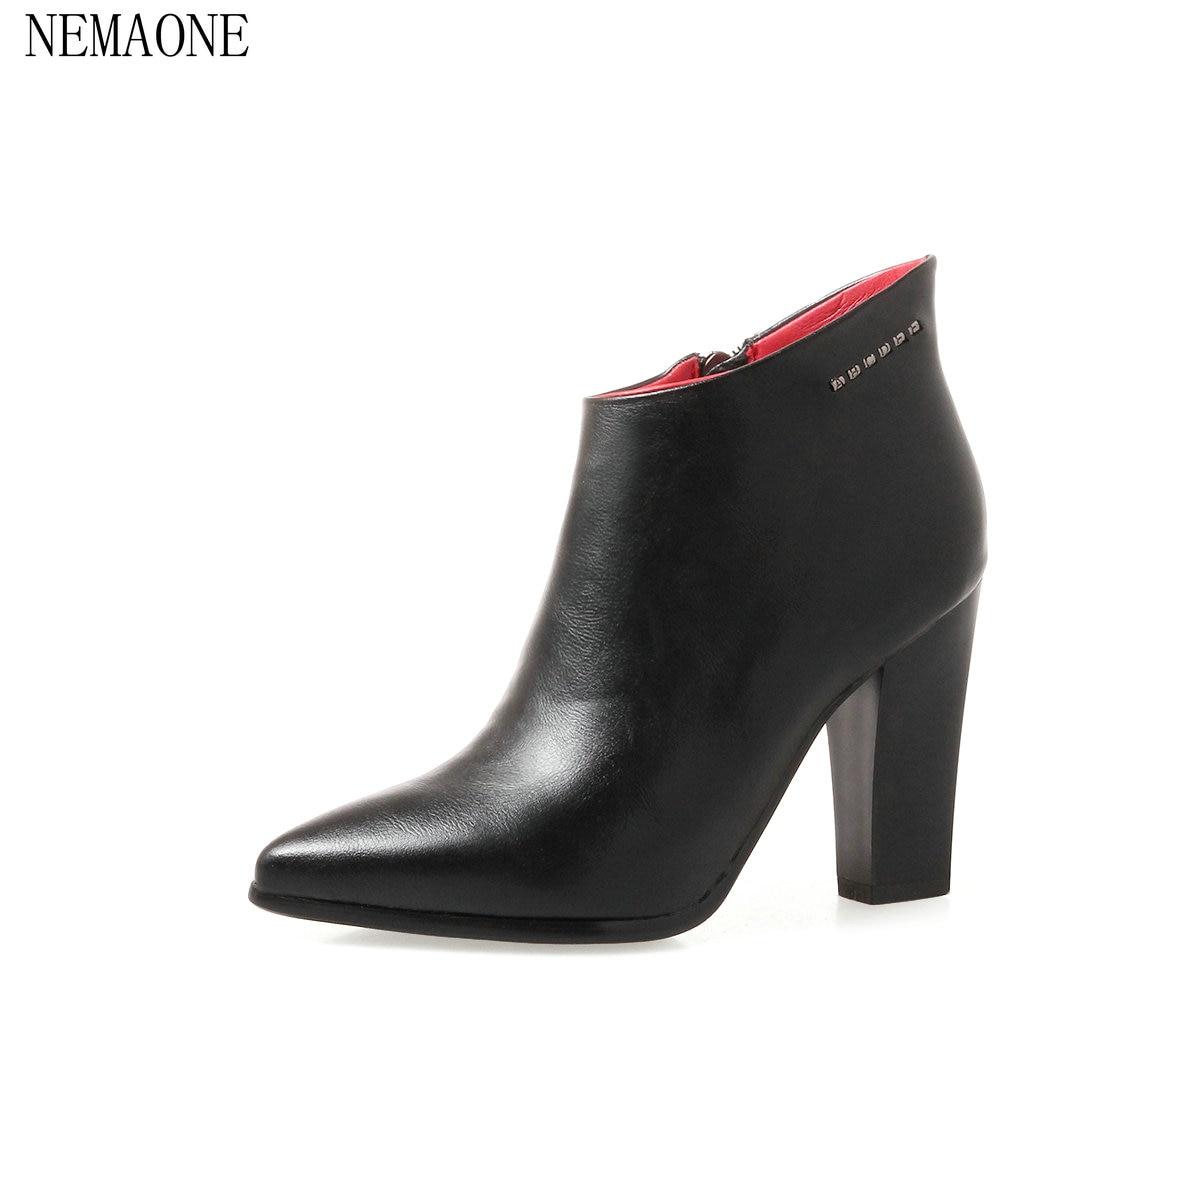 NEMAONE Woman Square High Heel Zipper autumn boots Short Ankle Boots Fashion Round Toe Dress Boots Black green